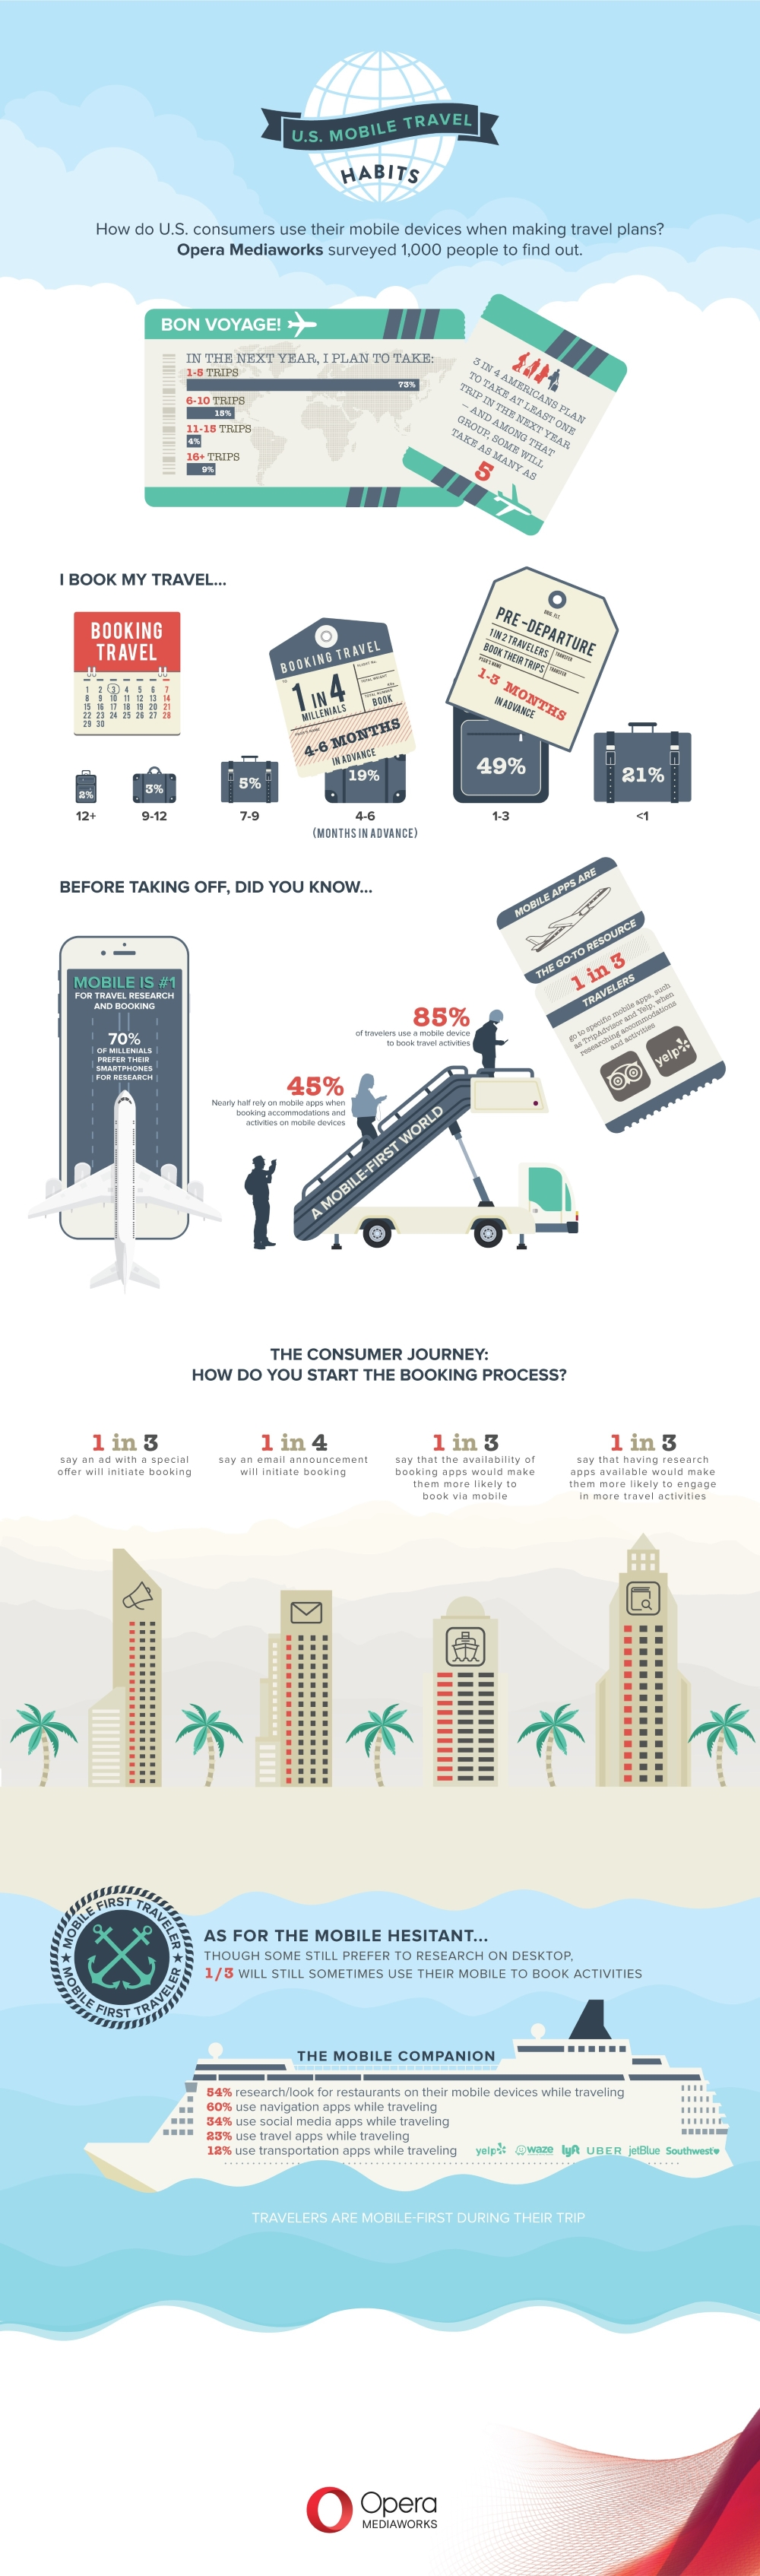 Opera Travel Infographic